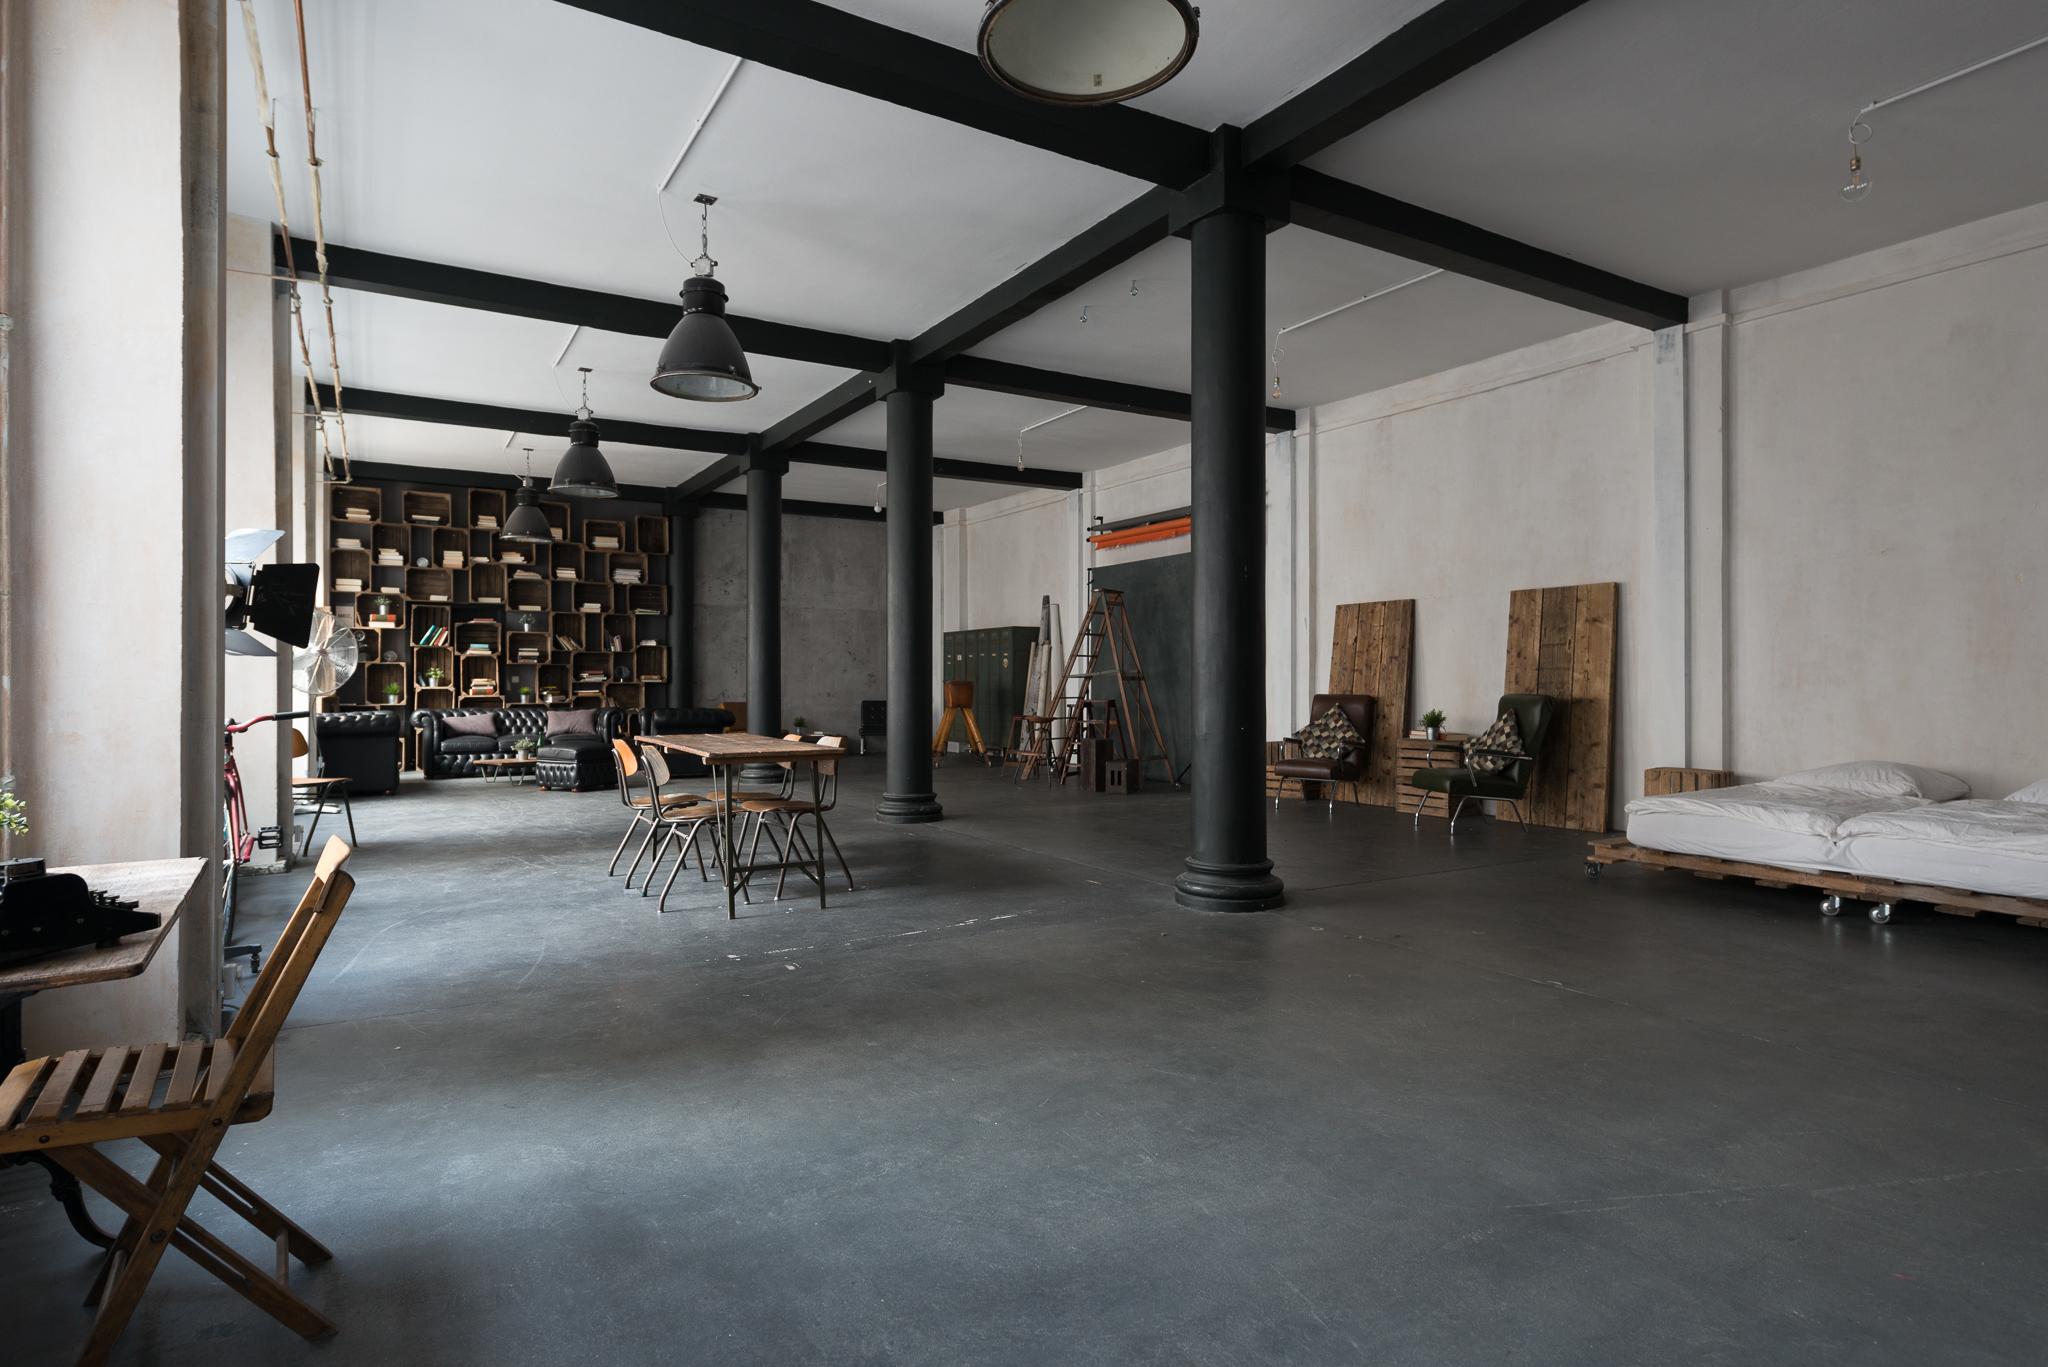 loftstudiocologne-factory-loft-2.jpg